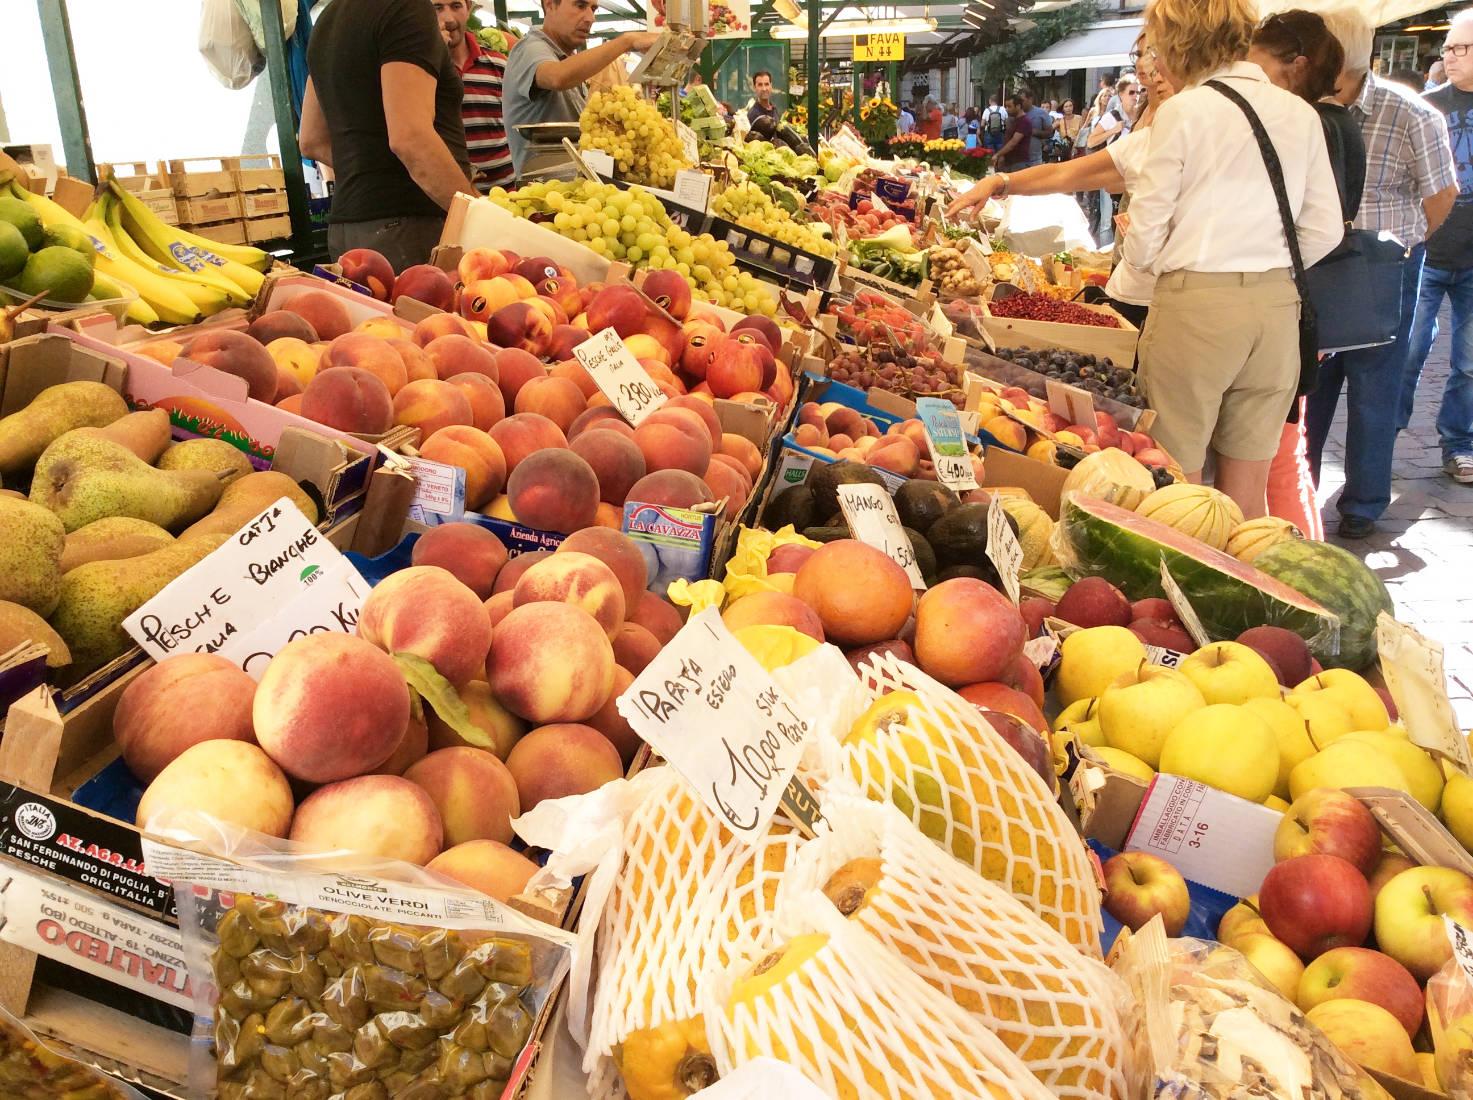 Marktstand in Bozen